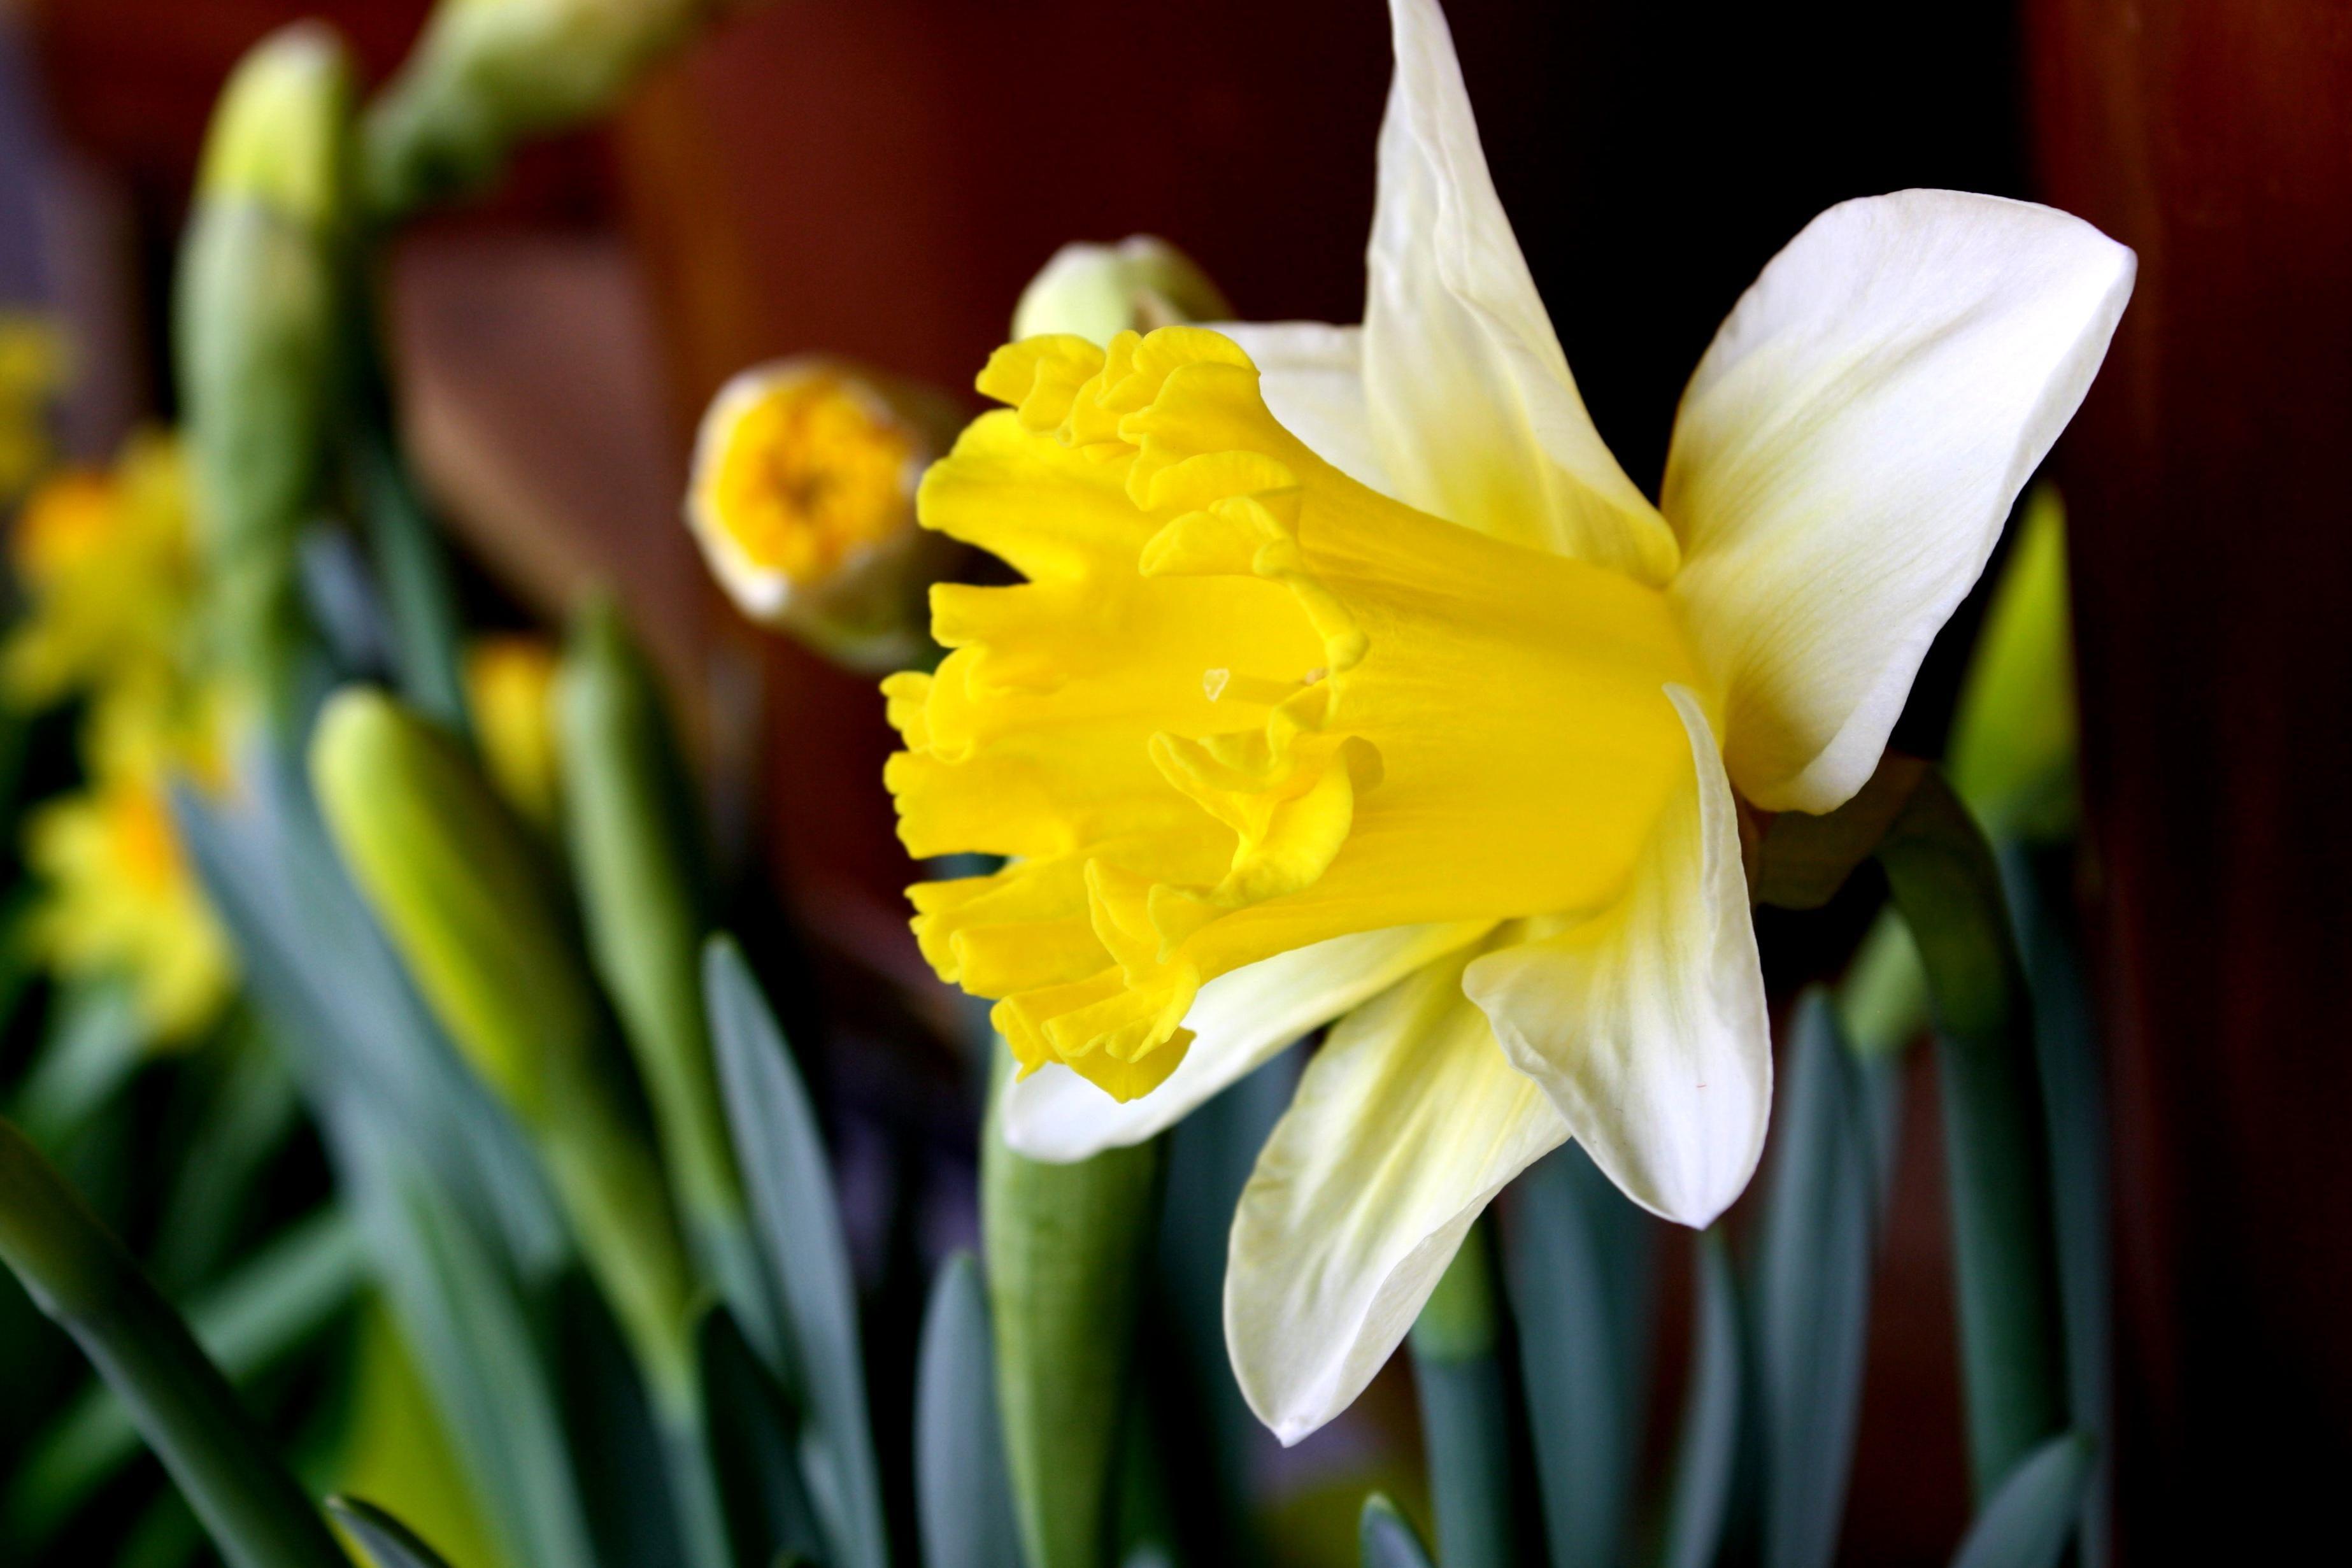 jonquille fleur tige verte pettals jaune pistil - Fleur Jonquille